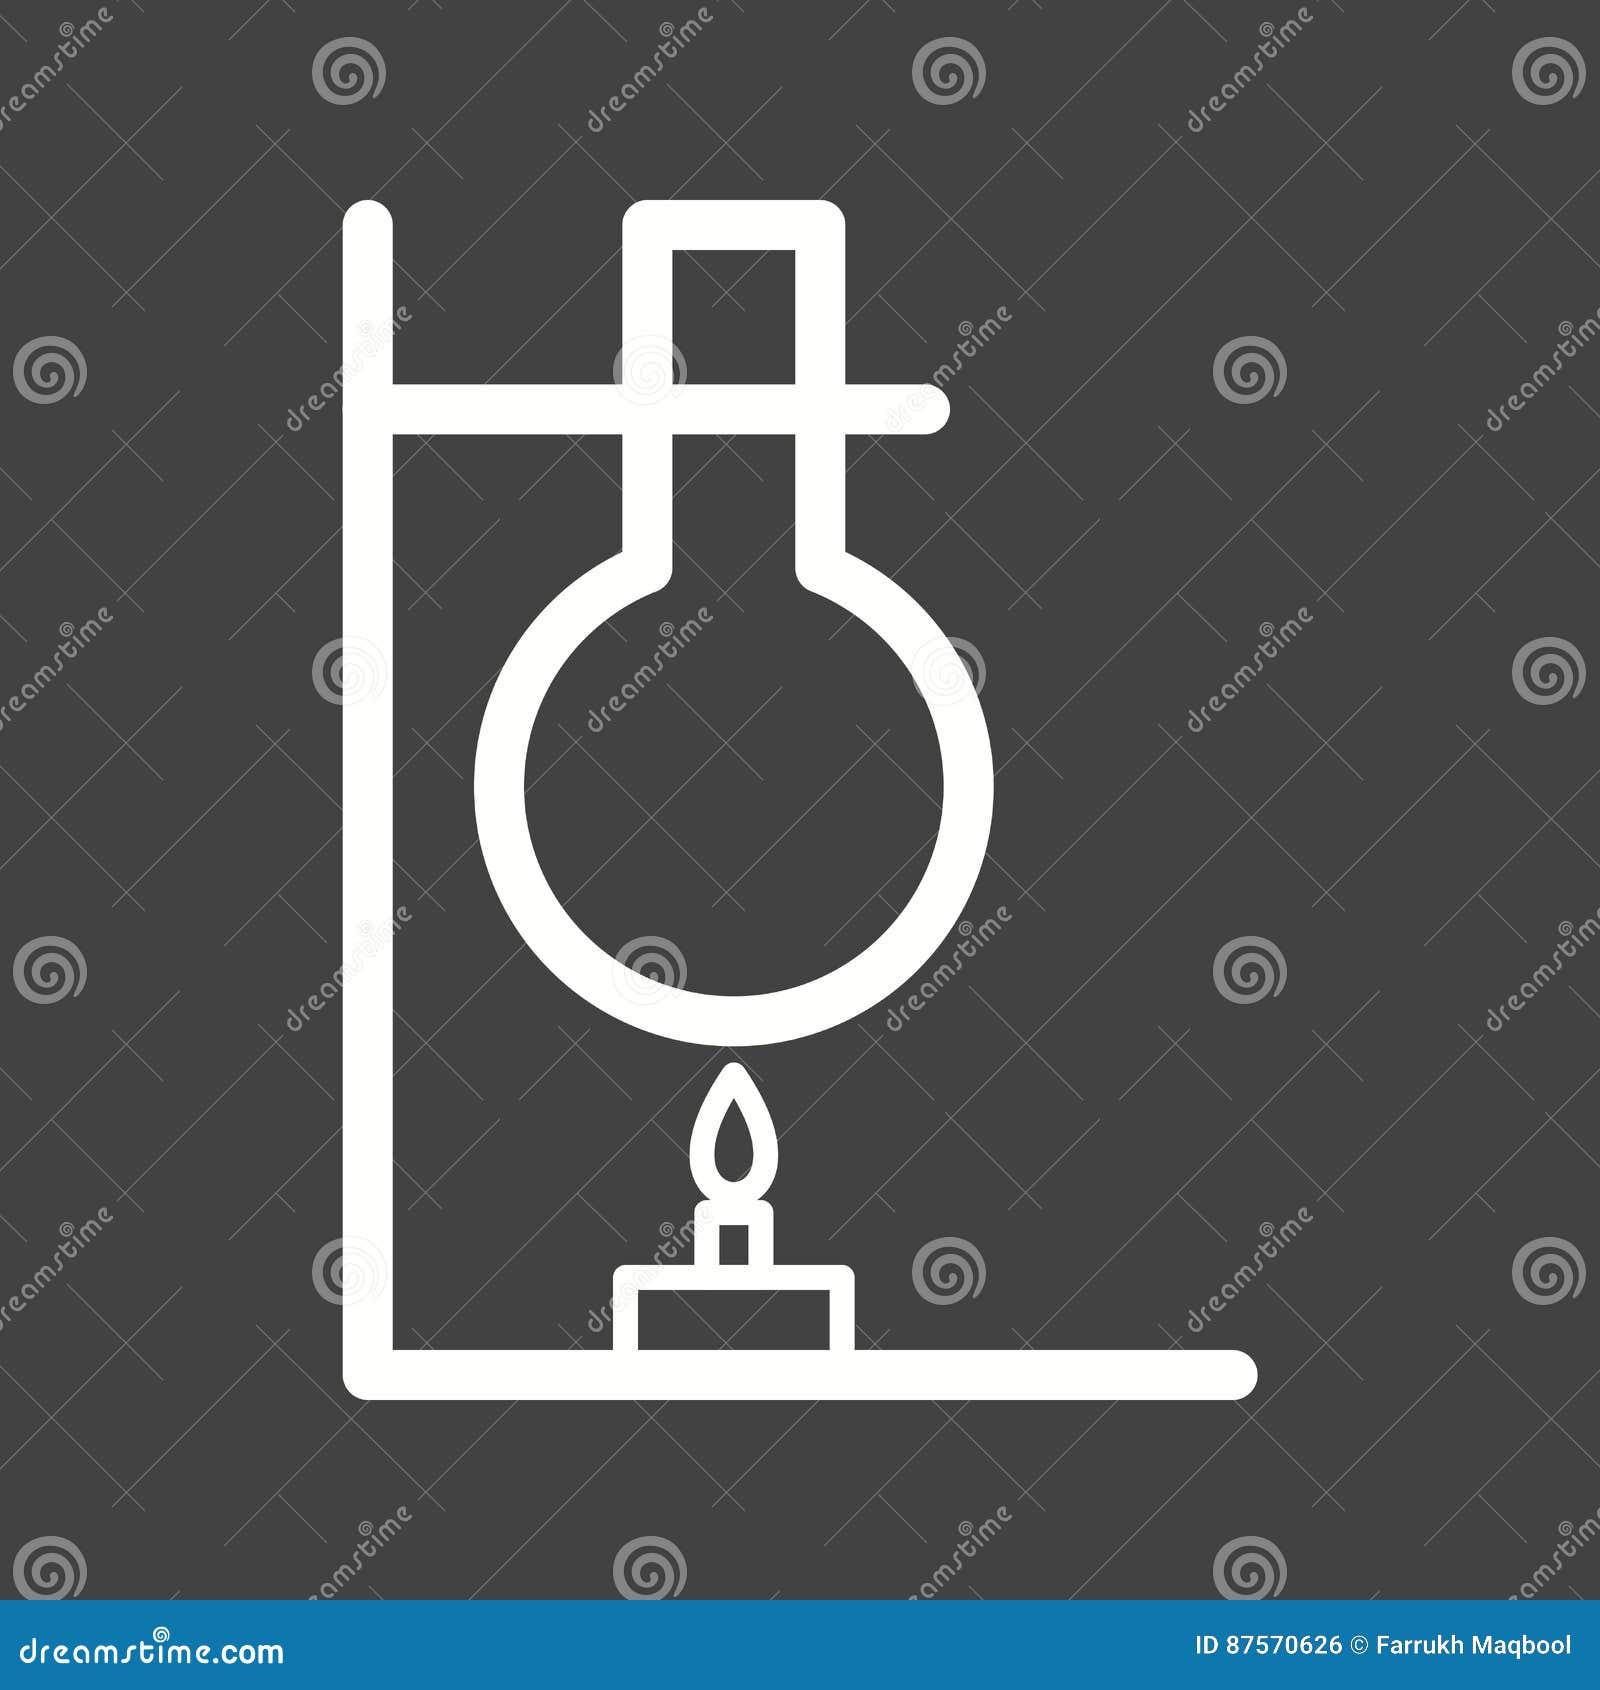 Experiment On Heat I Vector Illustration | CartoonDealer ...